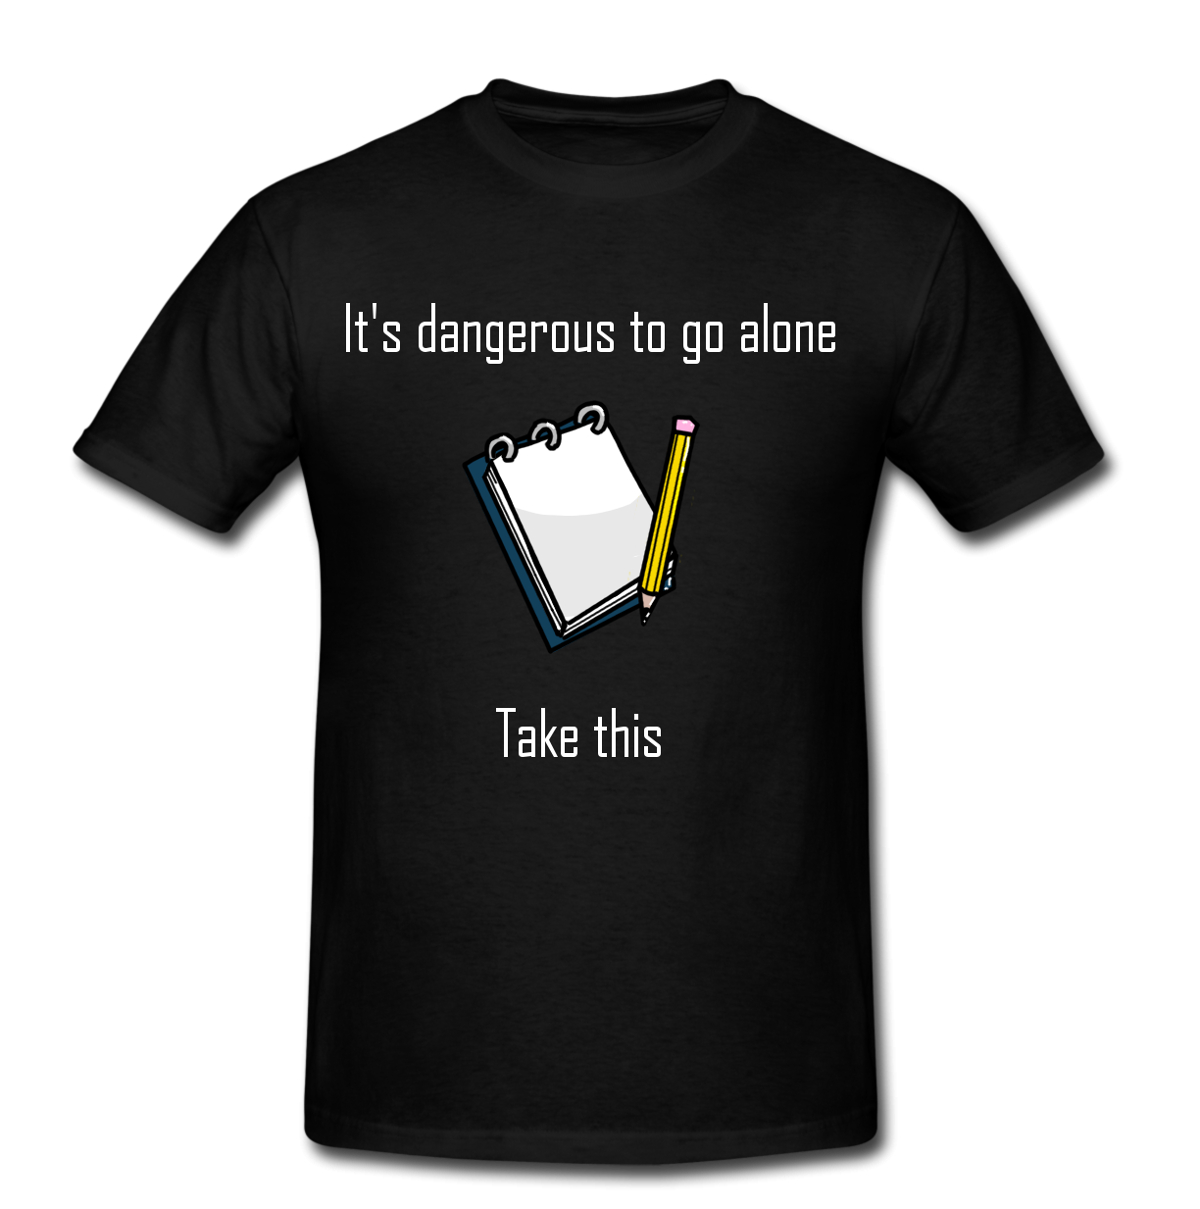 Arty Shirt